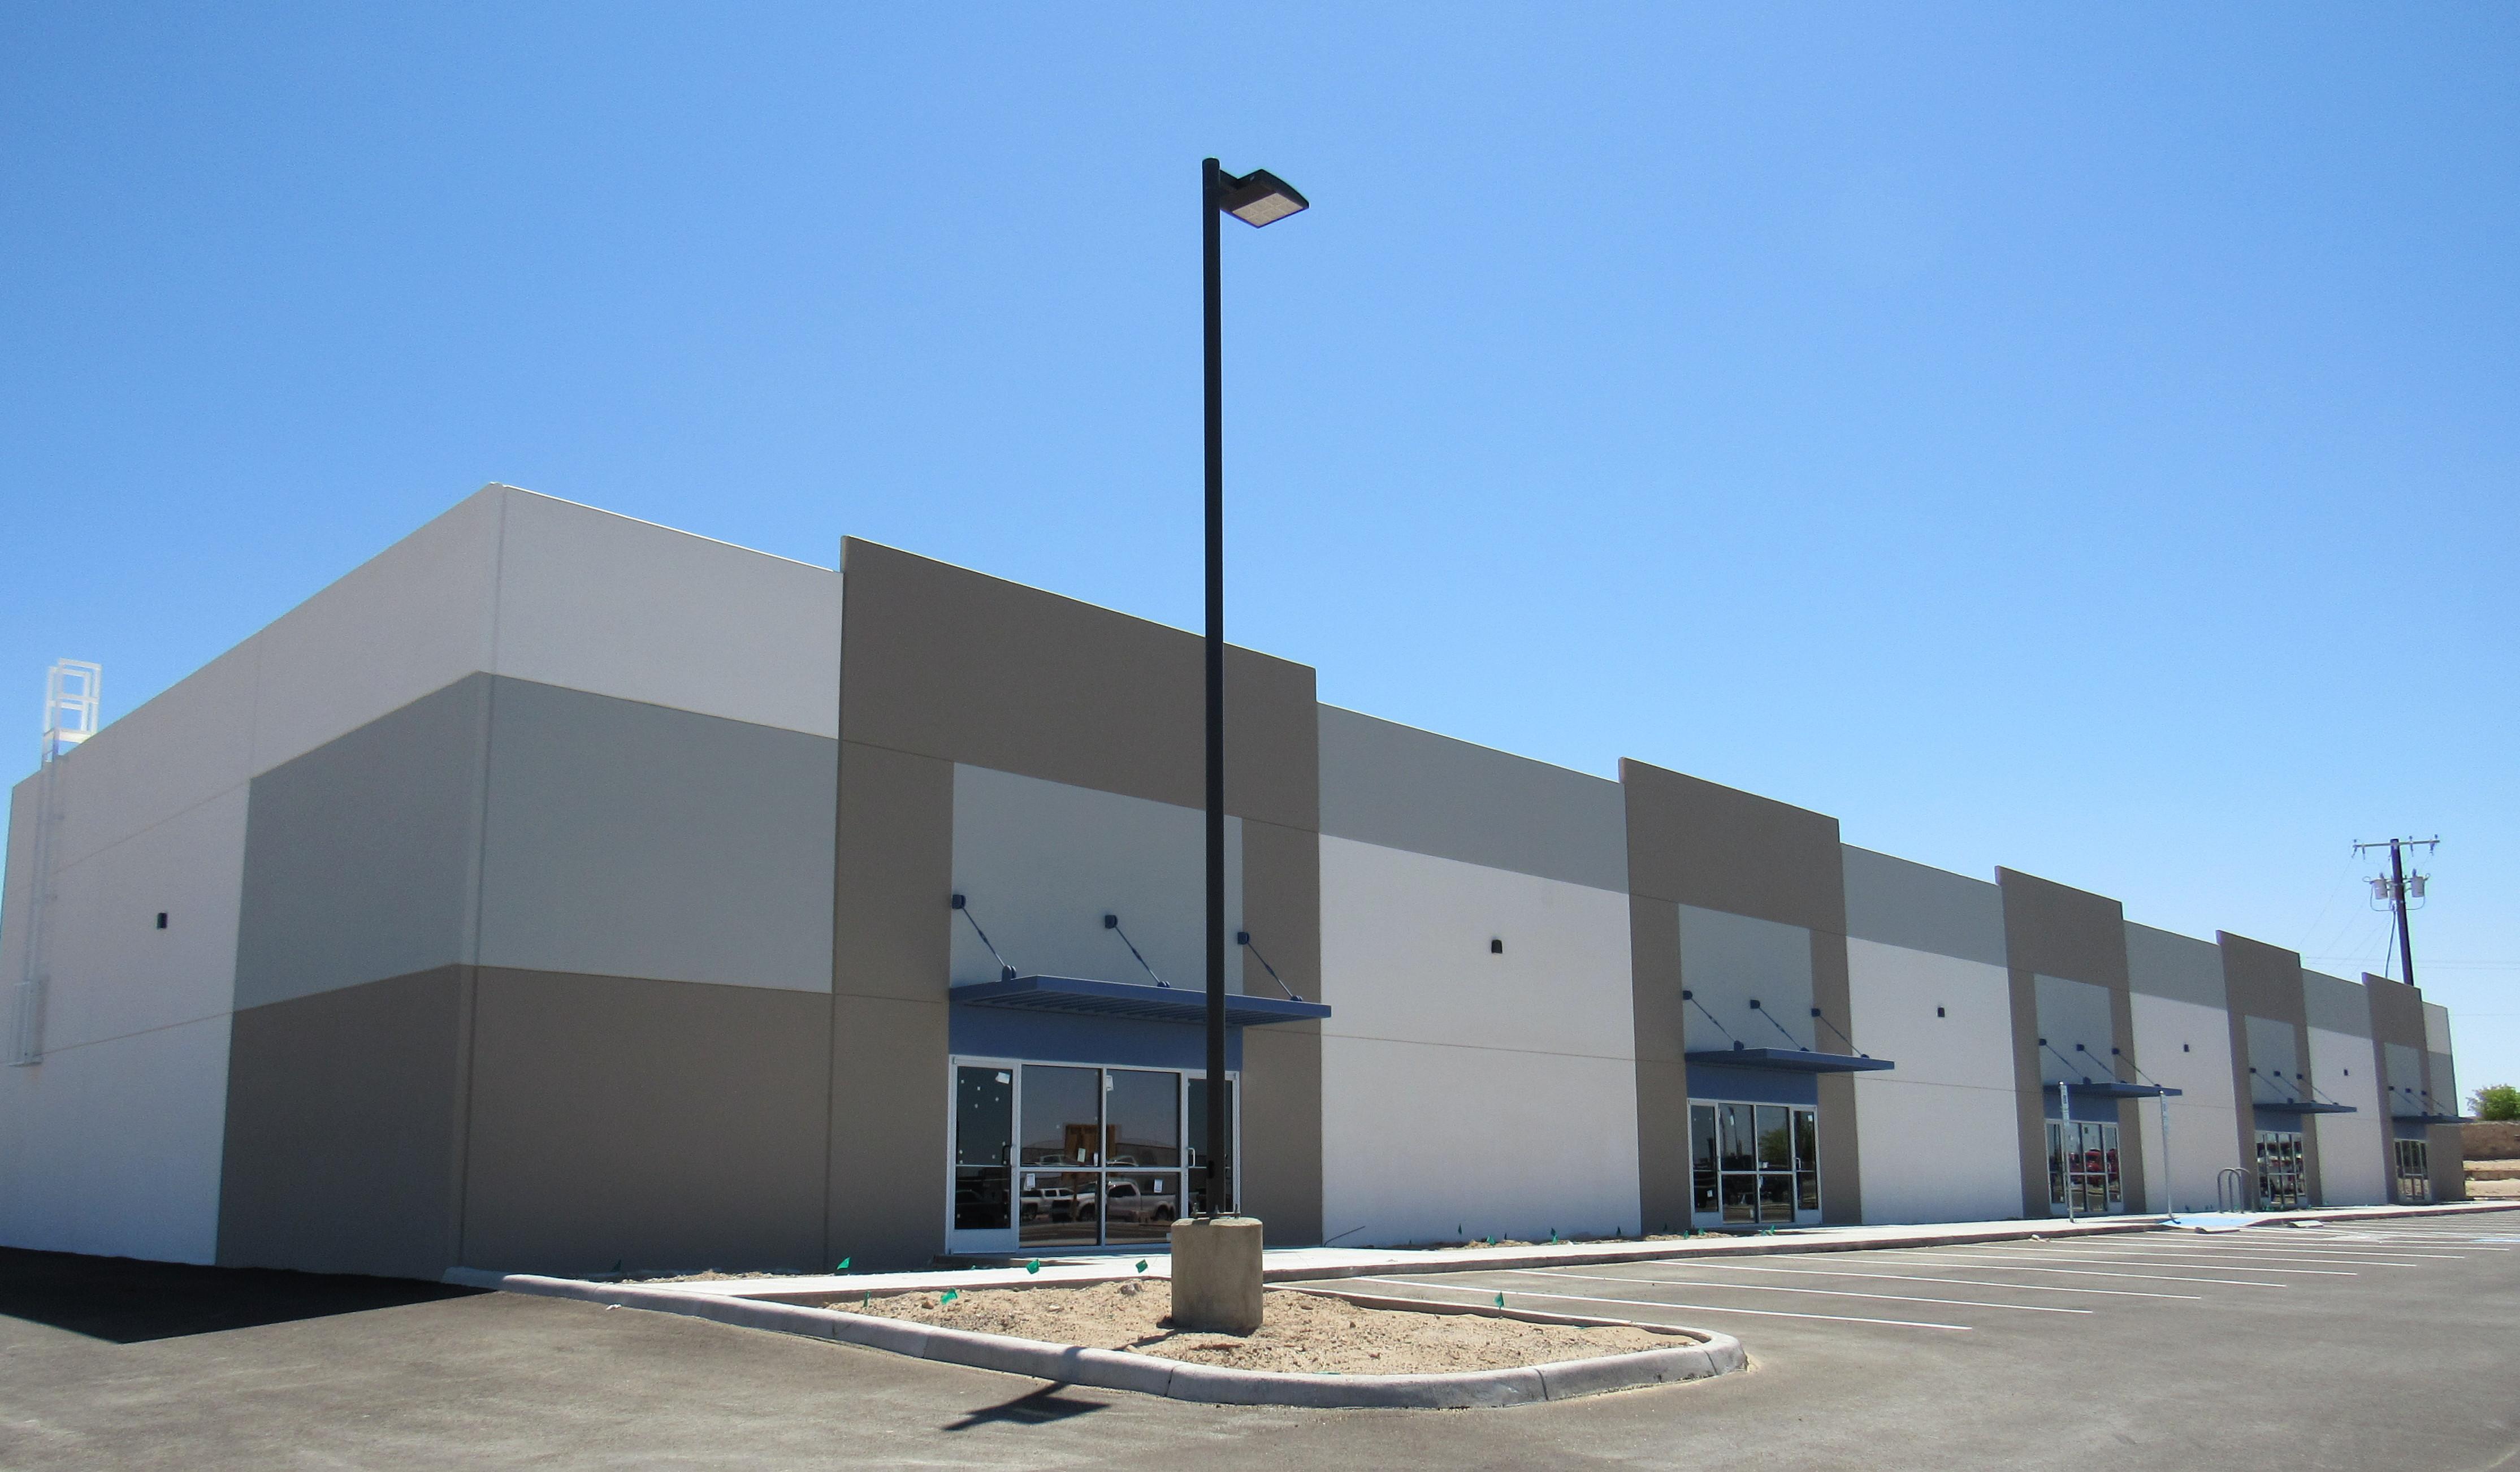 El Paso, TX Commercial Real Estate - OfficeSpace com